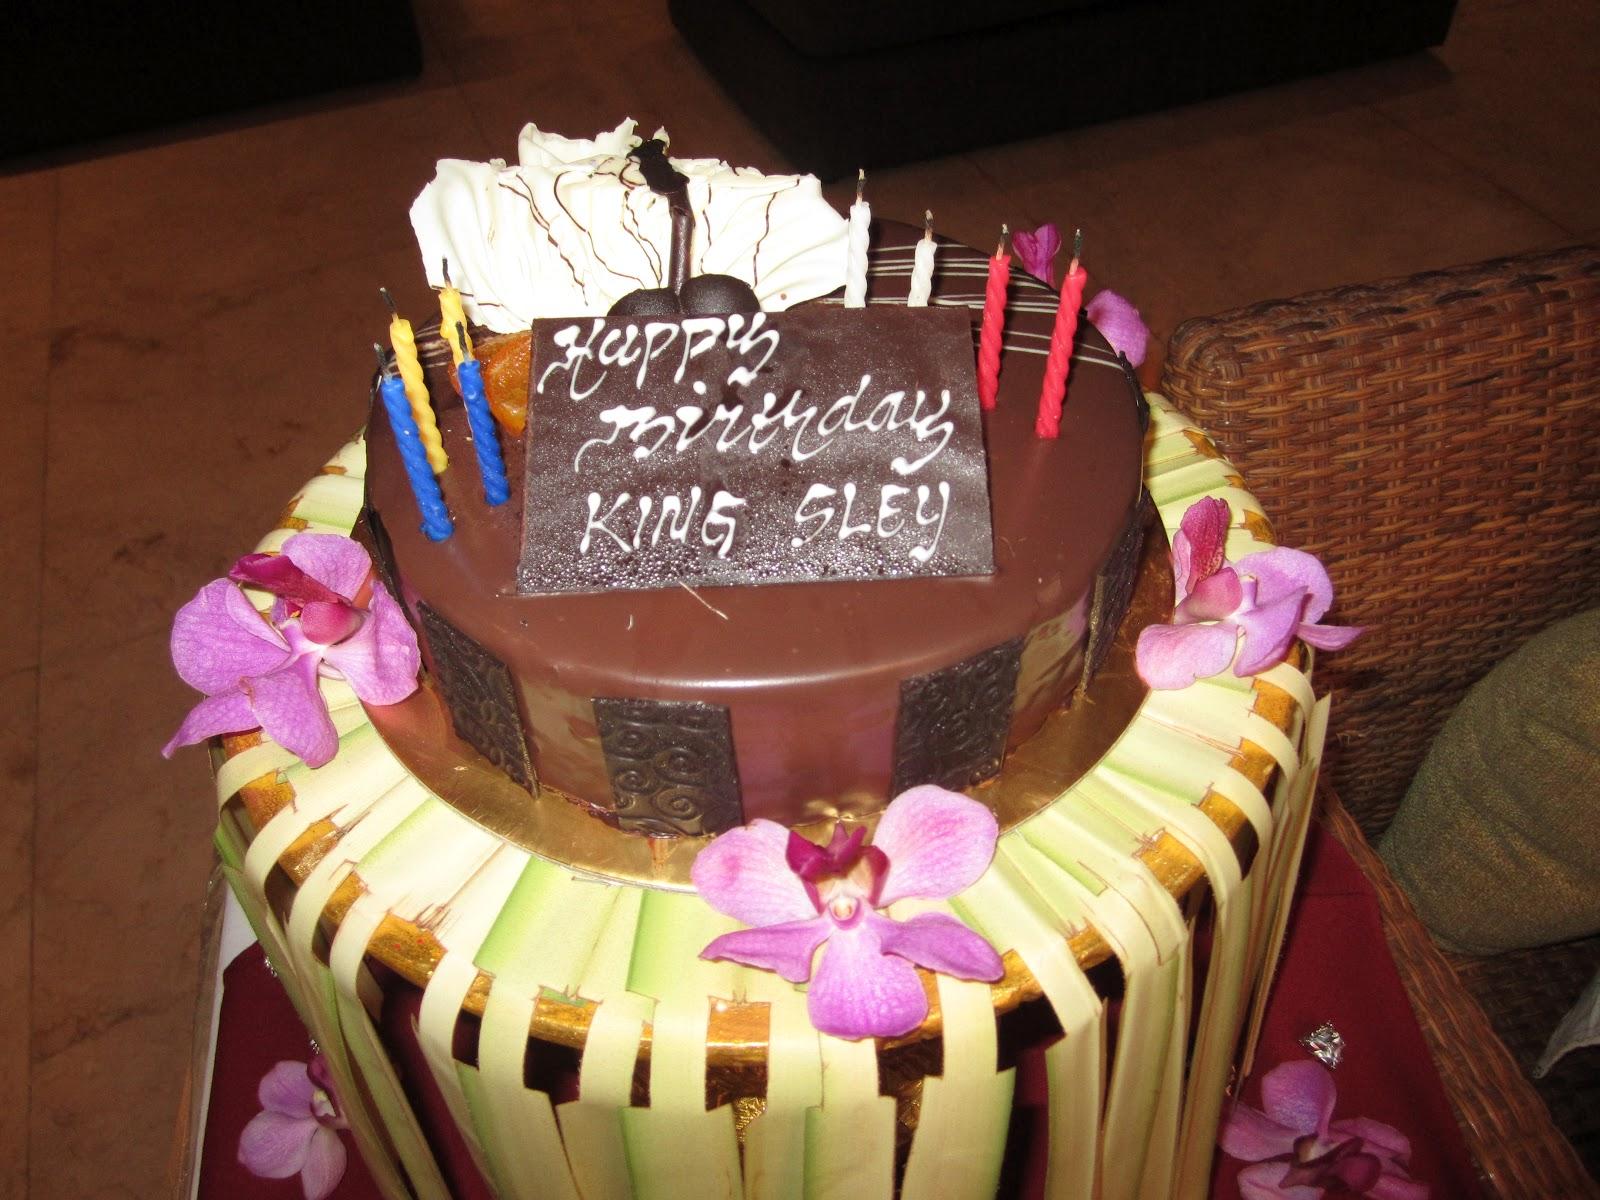 Sakura Story: Bali - Kingsleys 40th